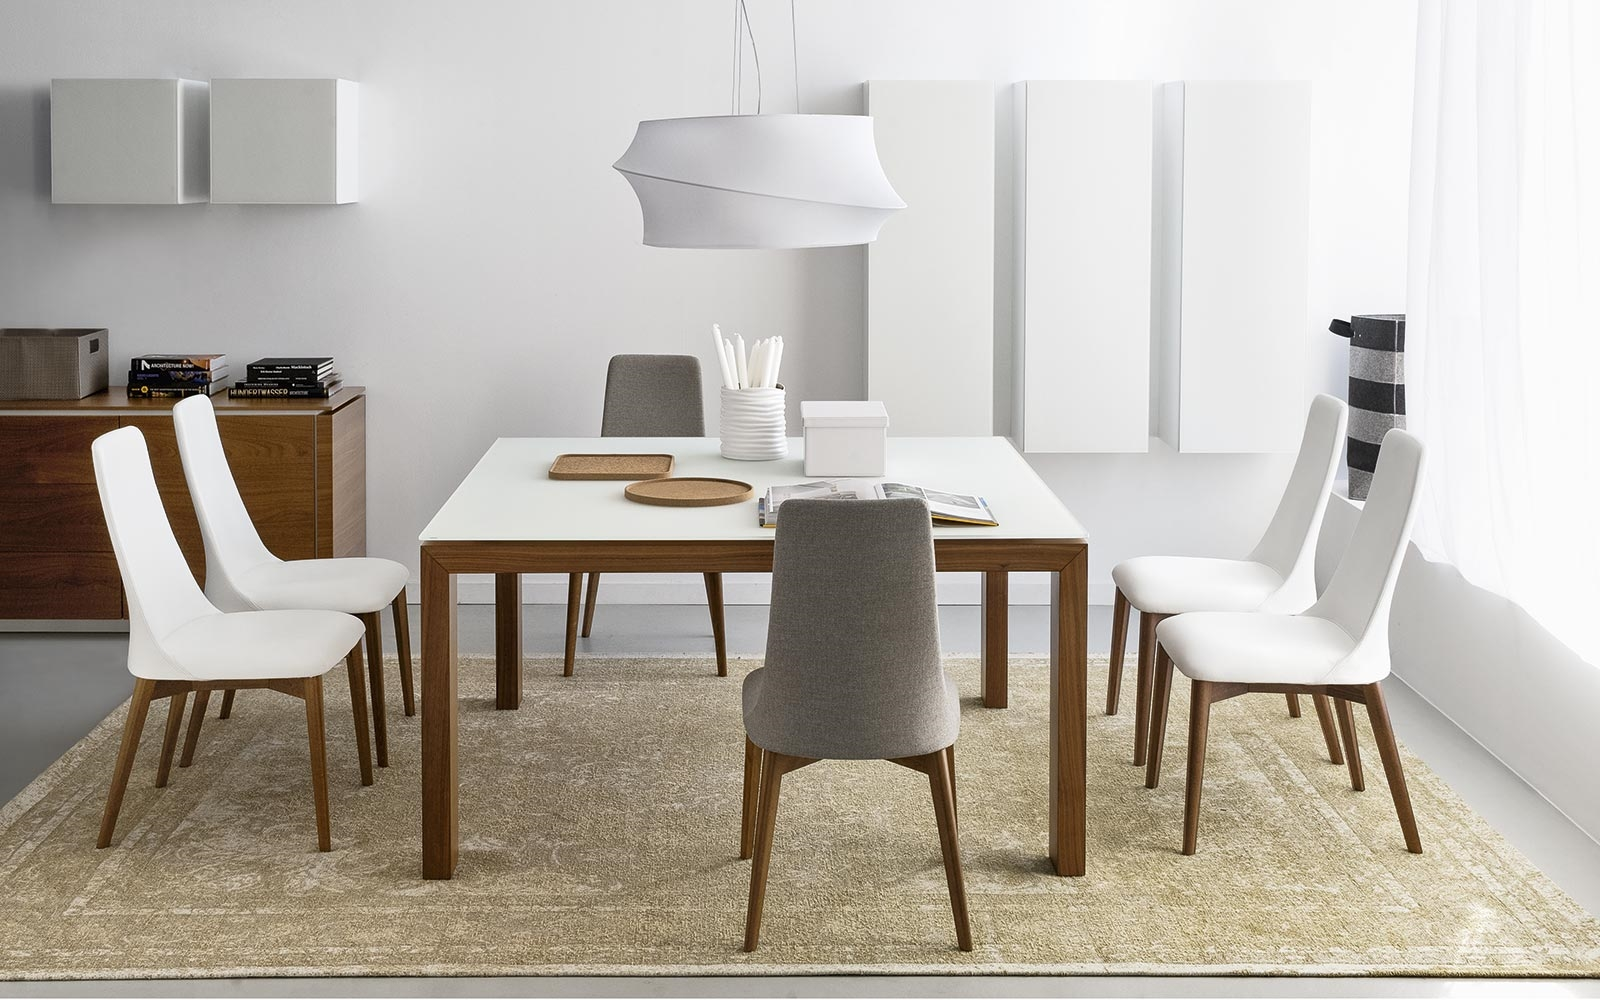 Tavolo calligaris sigma wood allungabile tavoli a prezzi - Tavolo allungabile calligaris ...